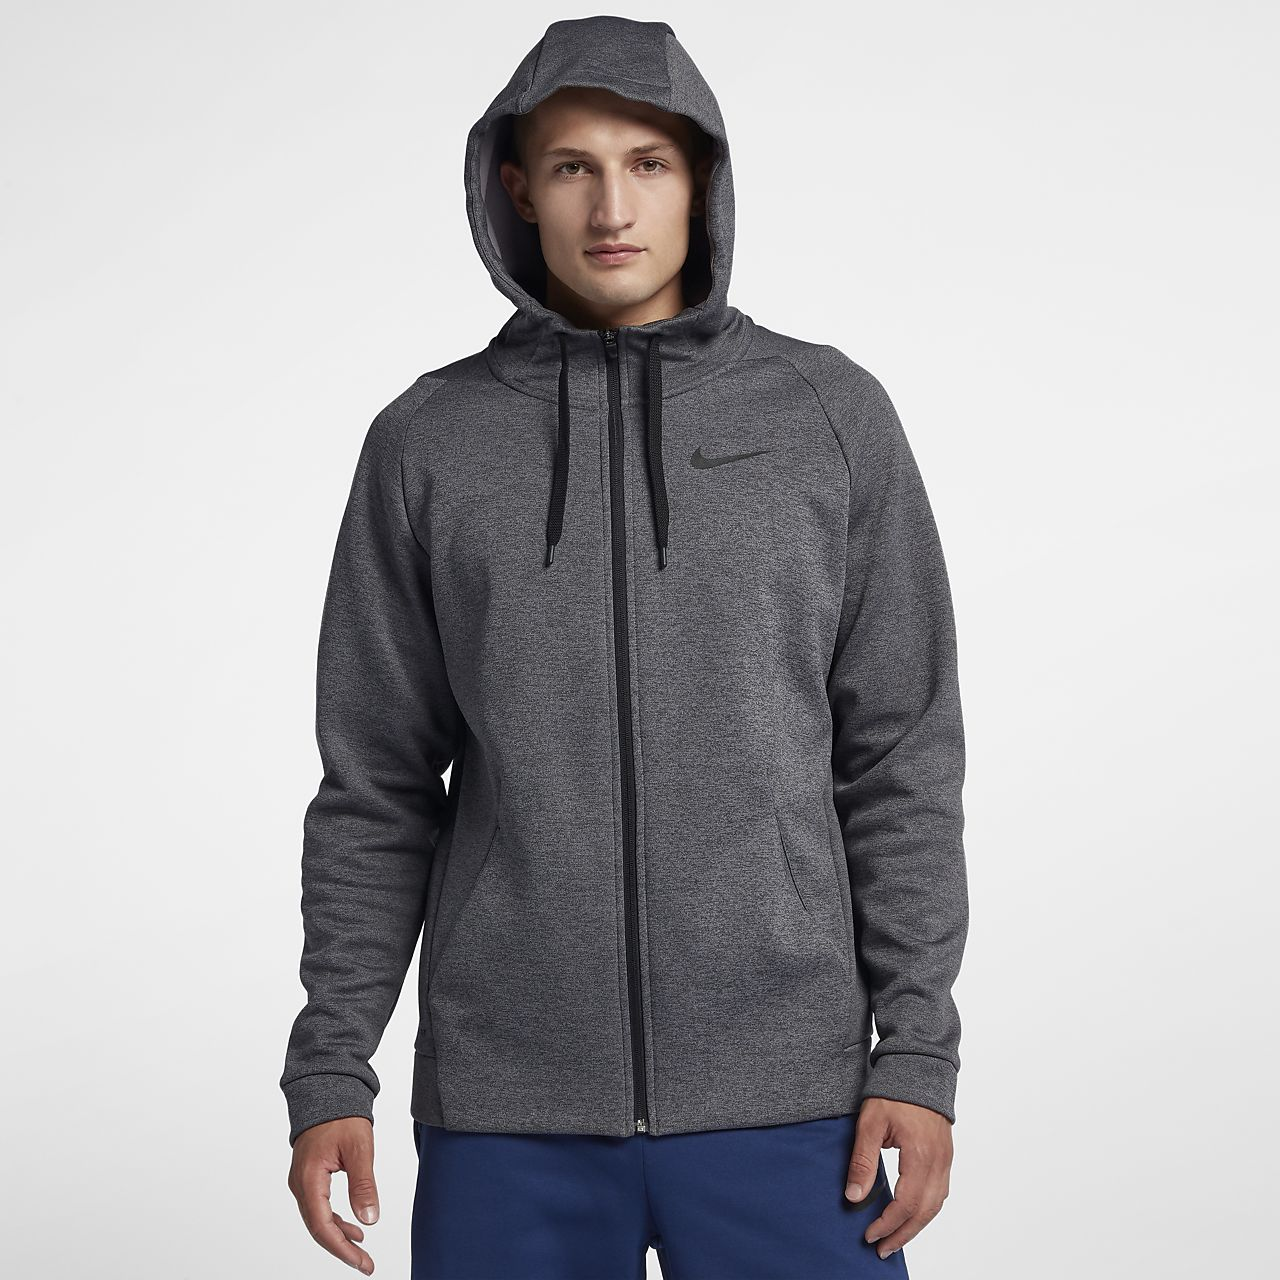 Details zu Nike Damen Trainings Freizeit Jacke Full Zip Hoodie Nike Dri FIT schwarz grau